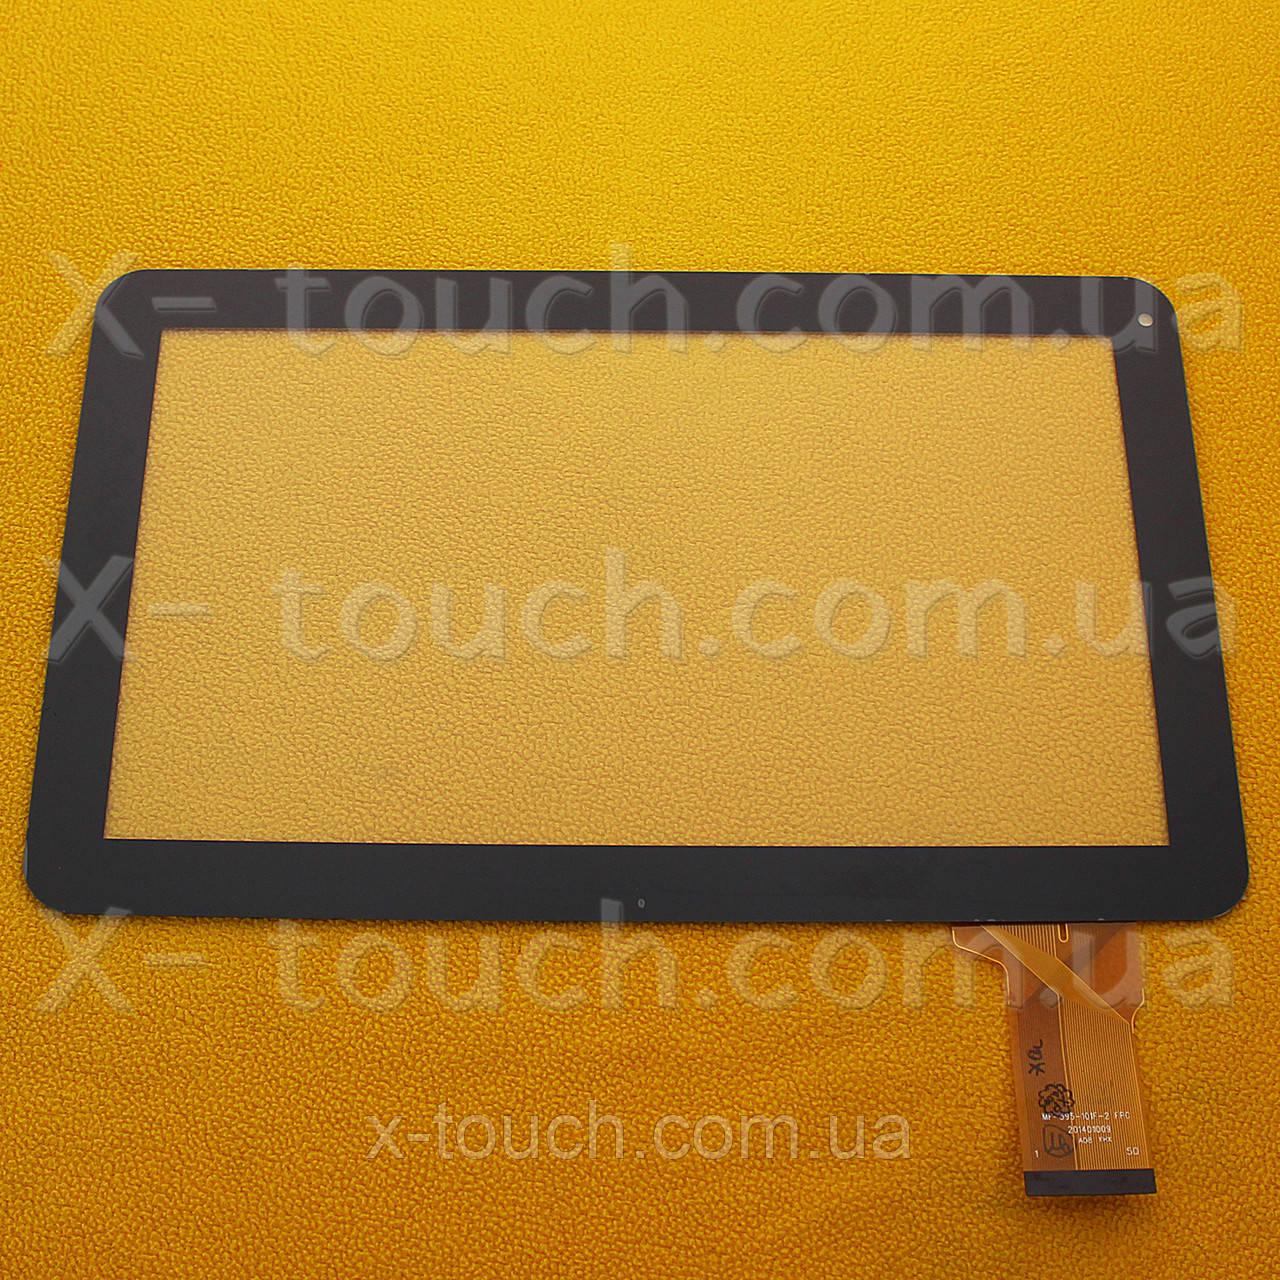 Тачскрин, сенсор  OPD-TPC0305  для планшета